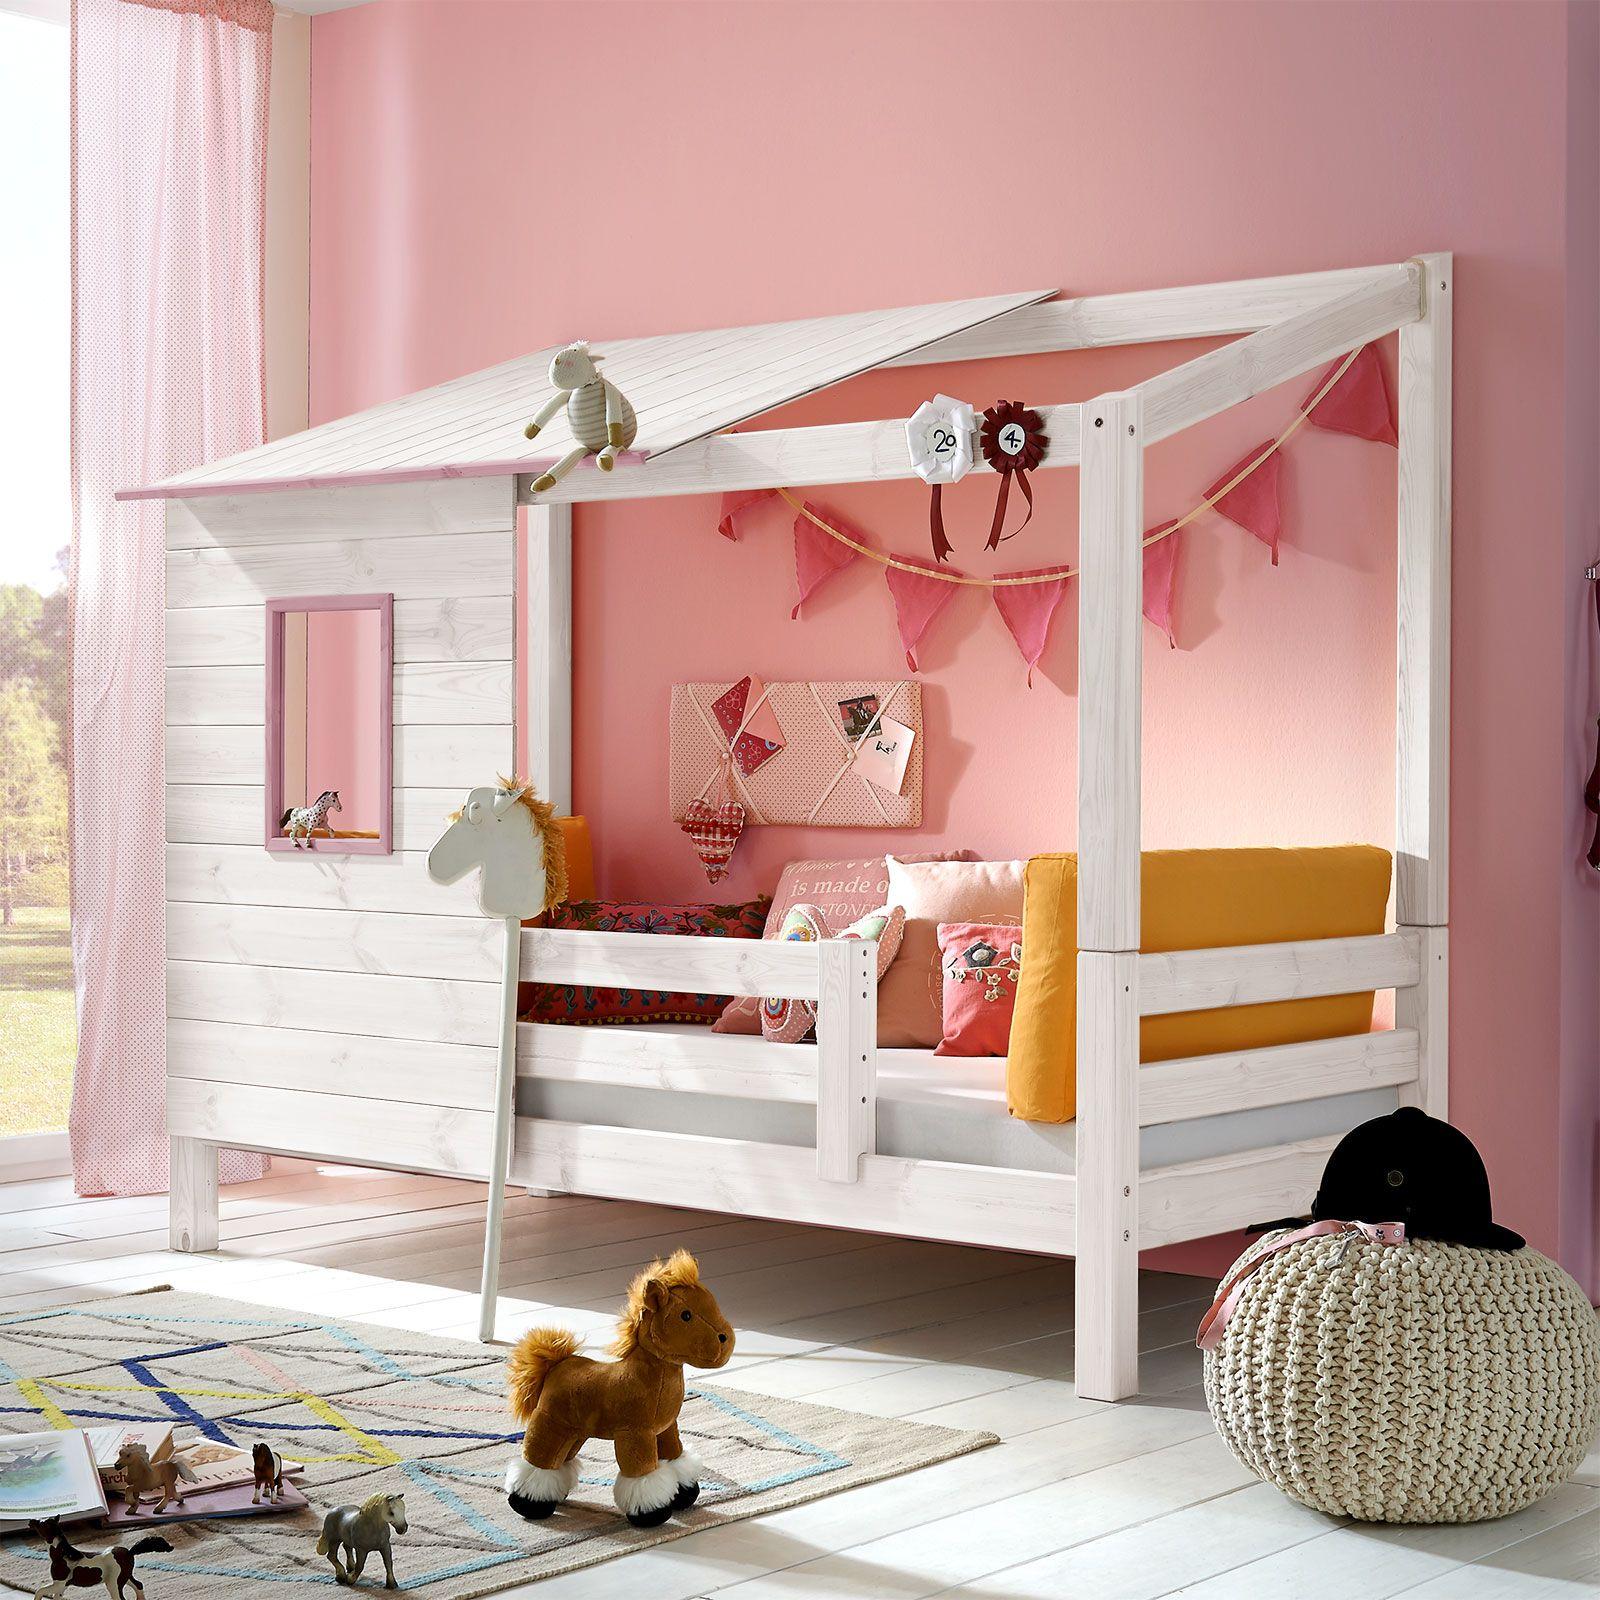 Abenteuerbett Kids Paradise Fur Madchen Kinder Zimmer Abenteuerbett Und Bett Kinderzimmer